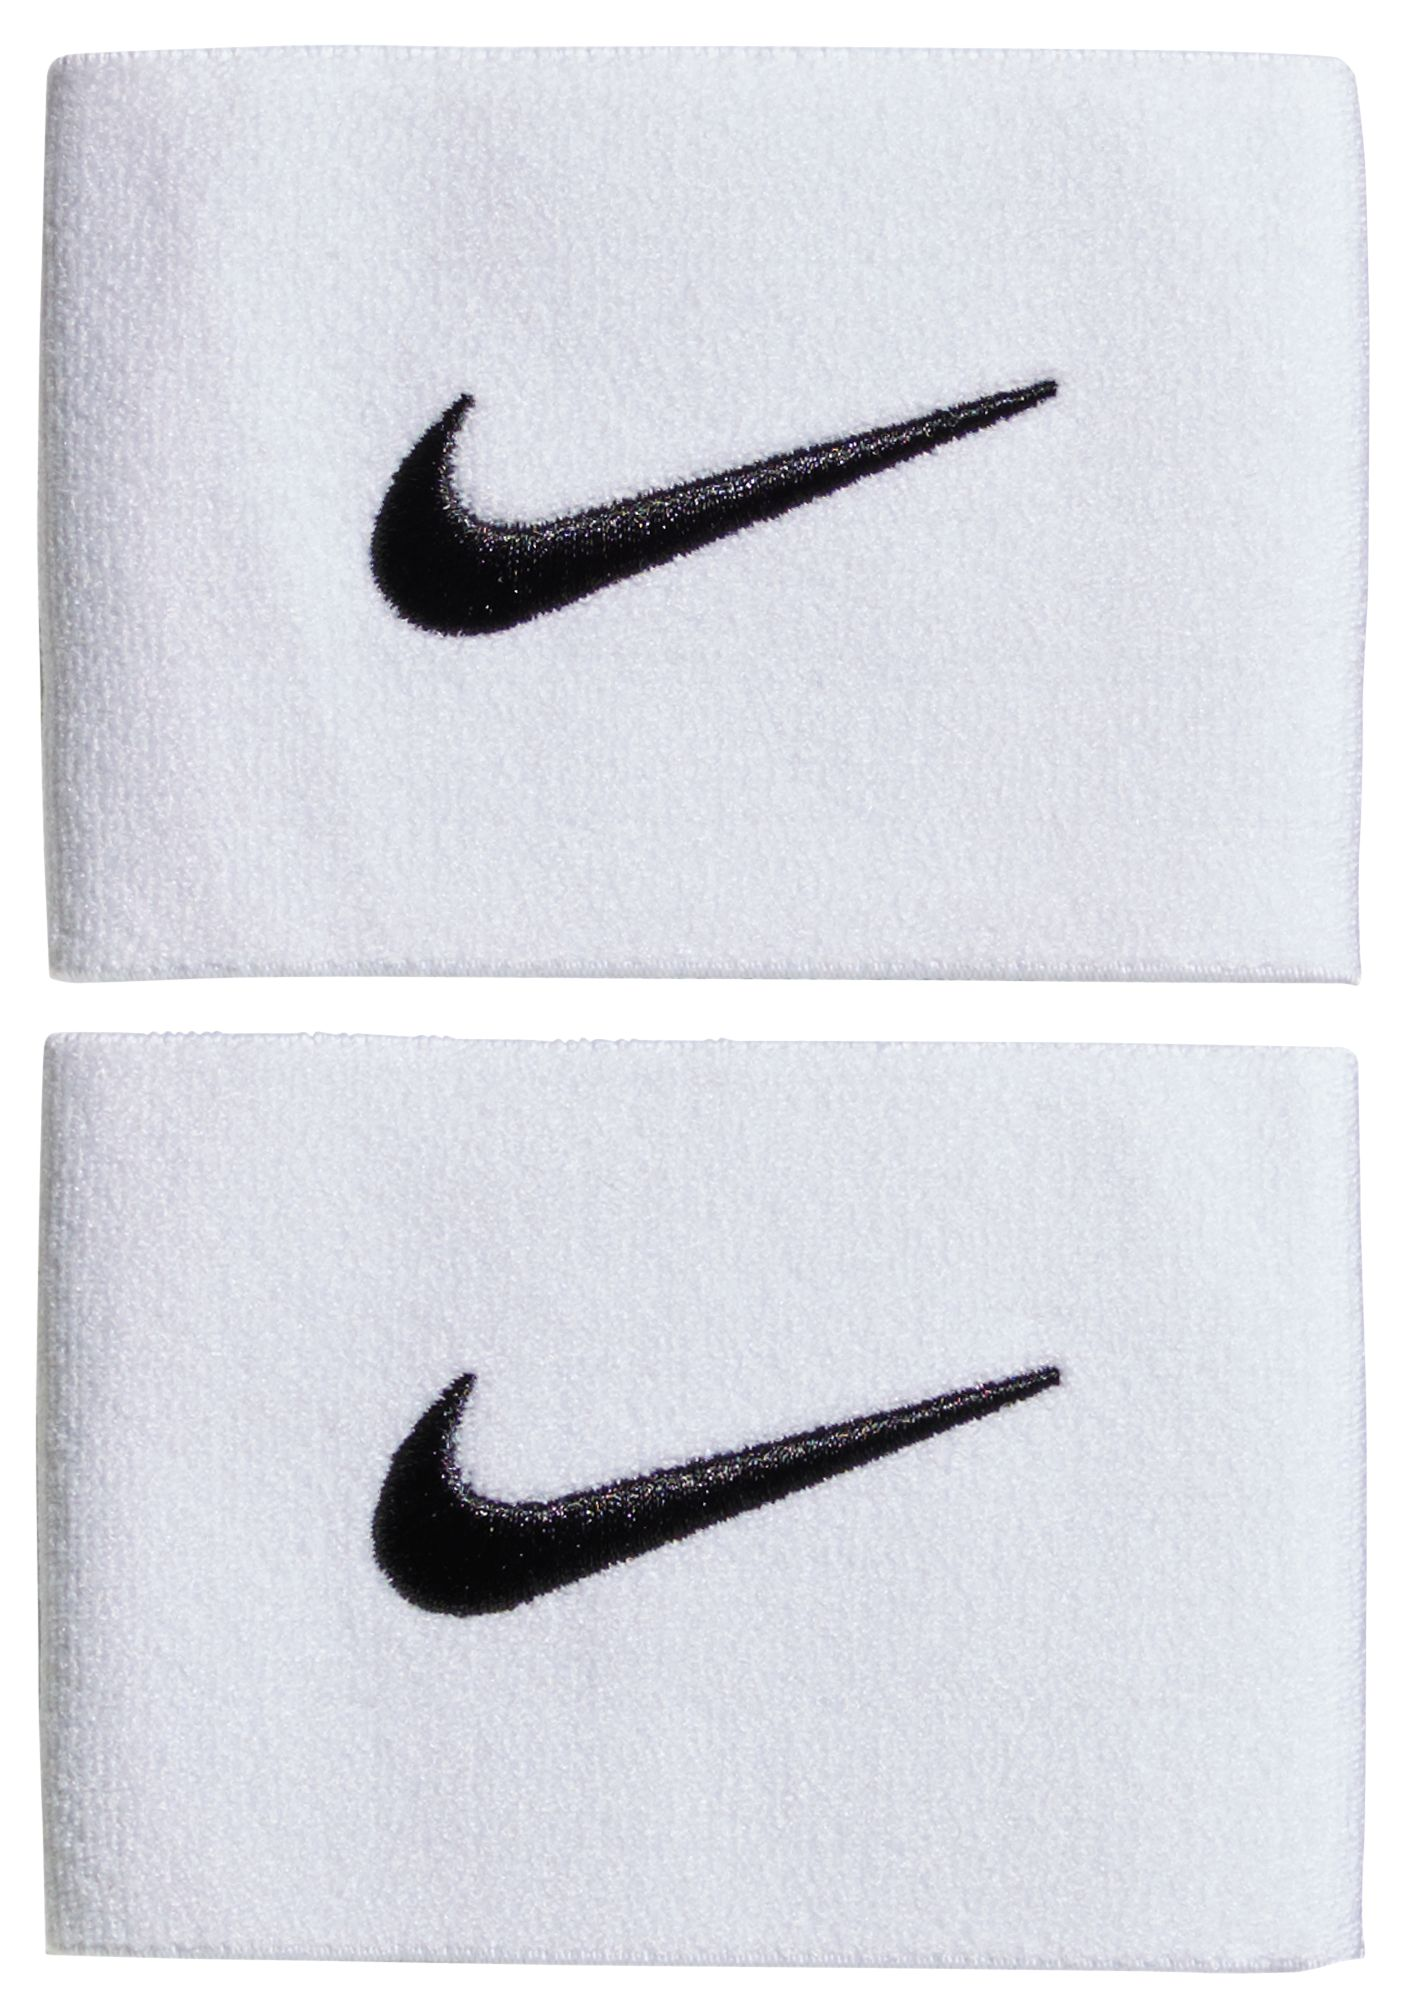 Nike Soccer Shin Guard Stays Dicks Sporting Goods